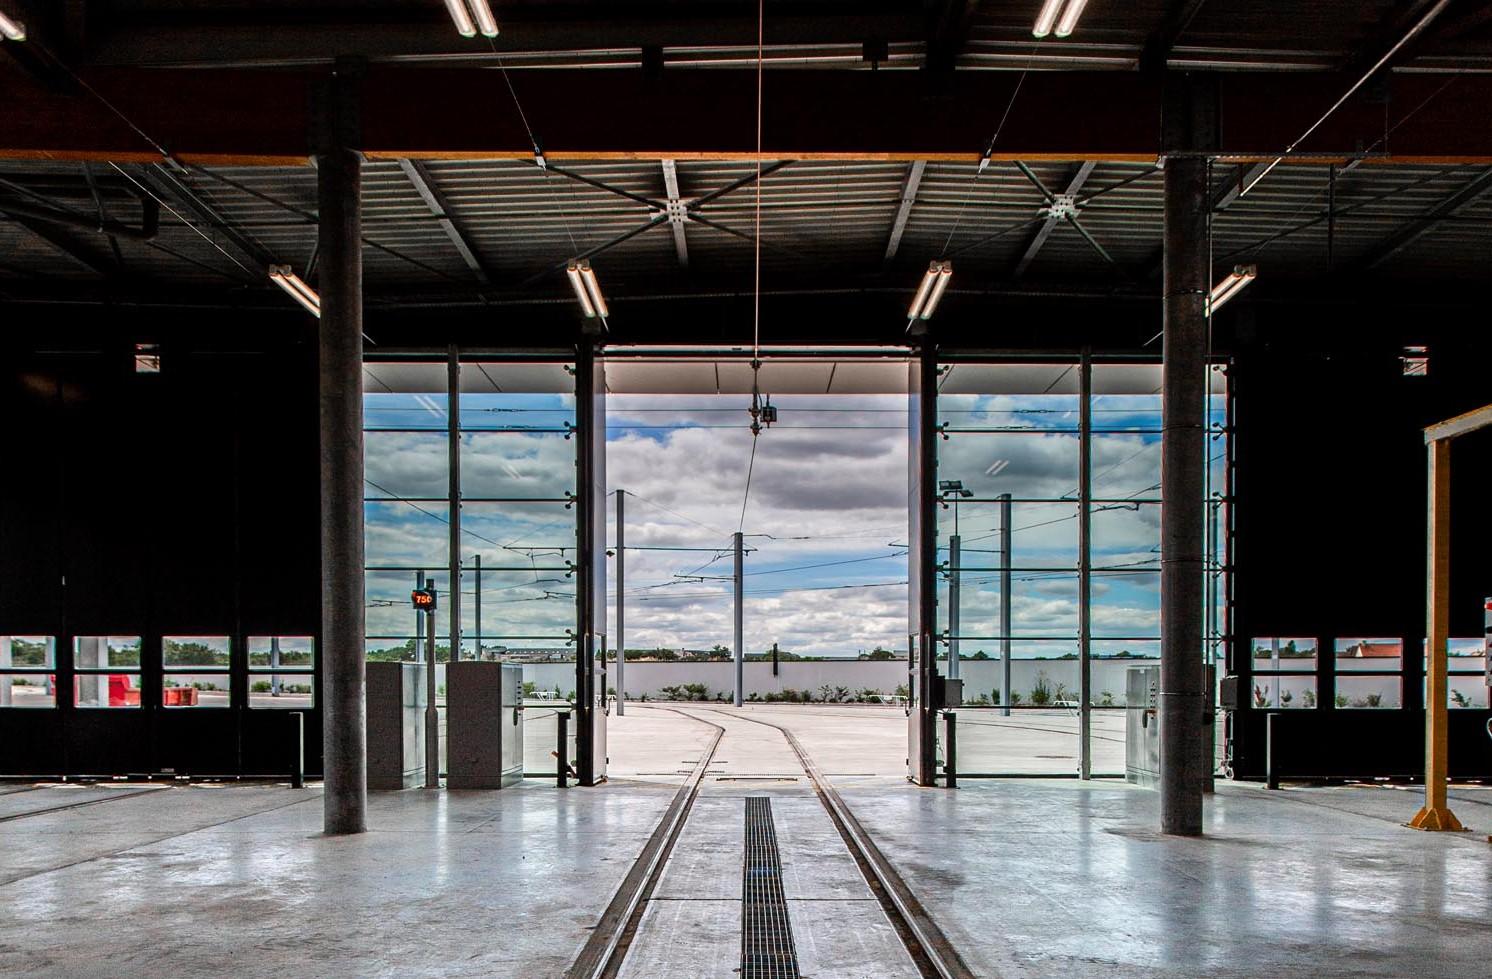 Centre maintenance tramways de Caen